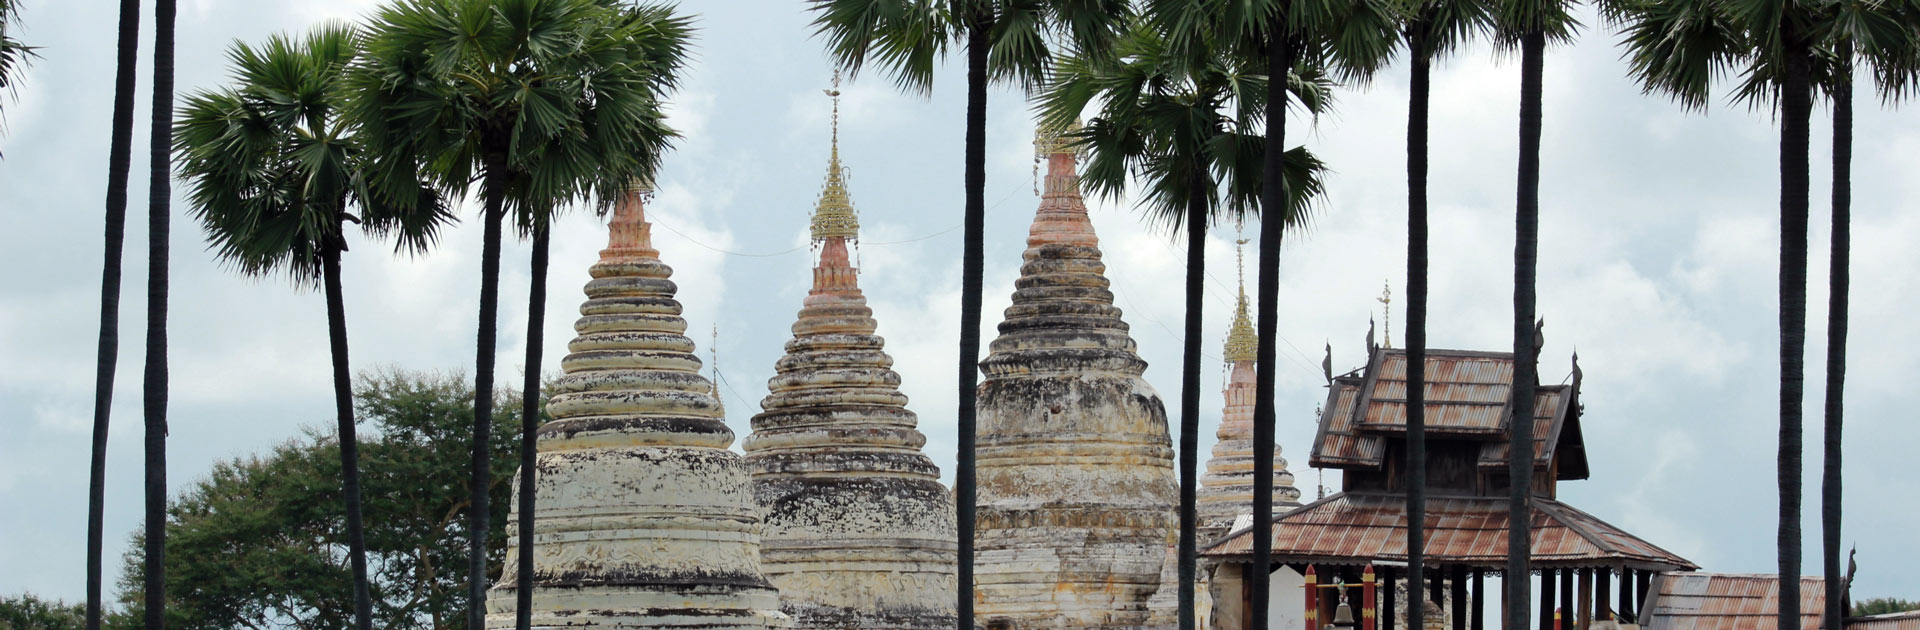 MM Myanmar Básico y Playa Ngapali 12 días 2